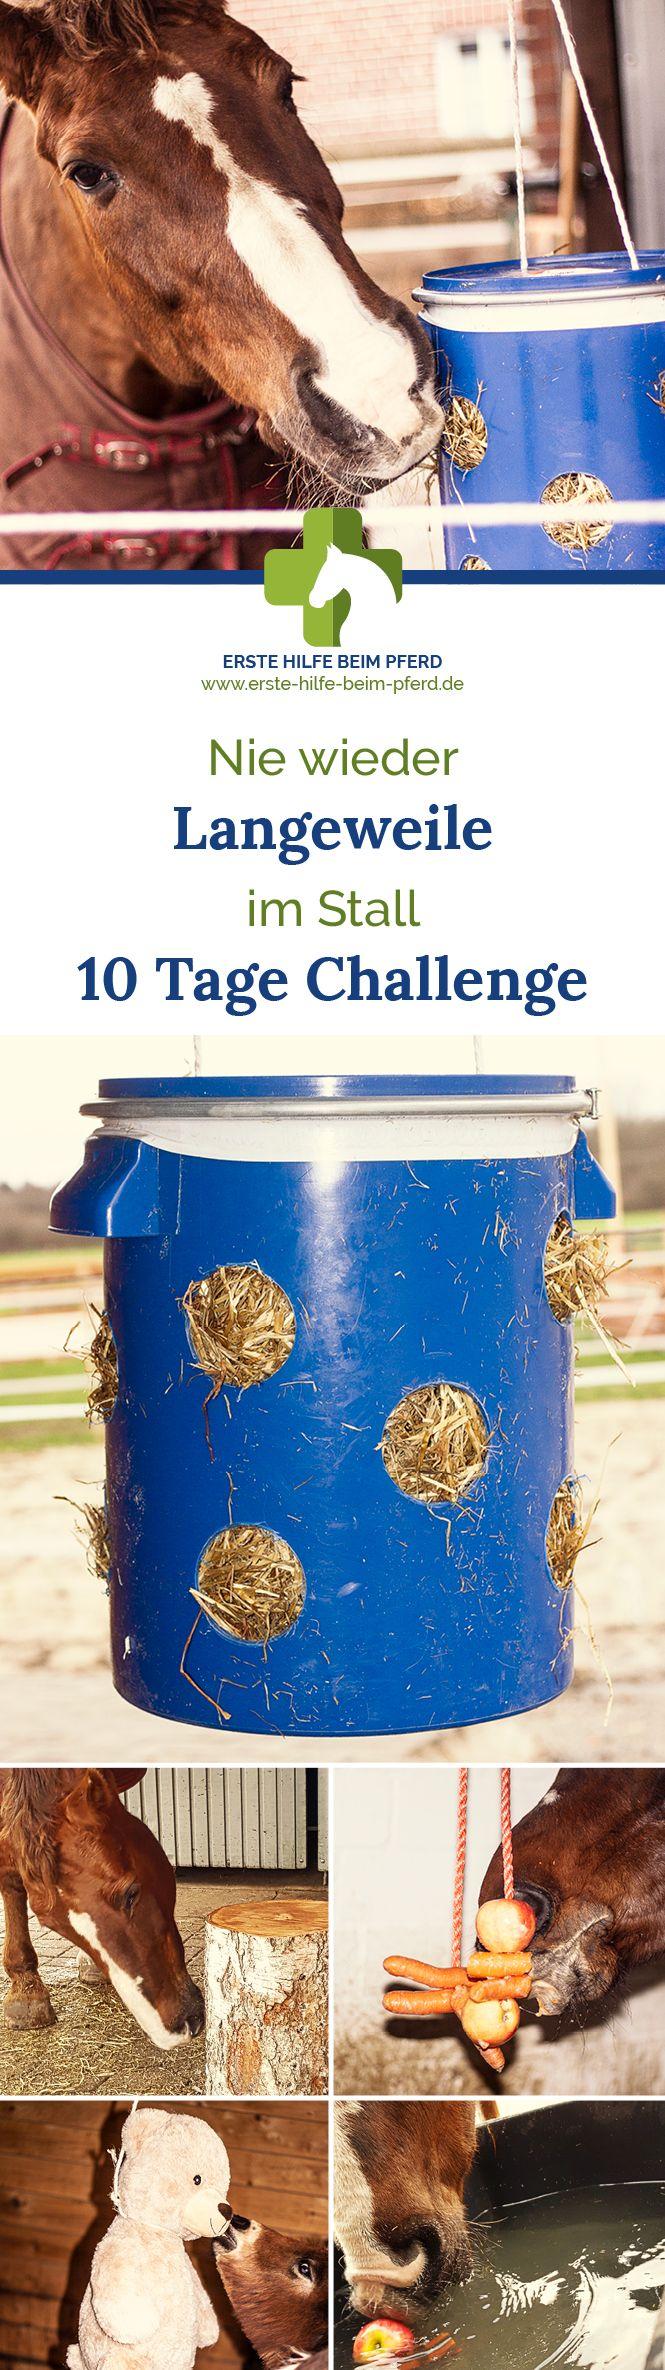 List of Latest DIY Gegen Langeweile from erste-hilfe-beim-pferd.de